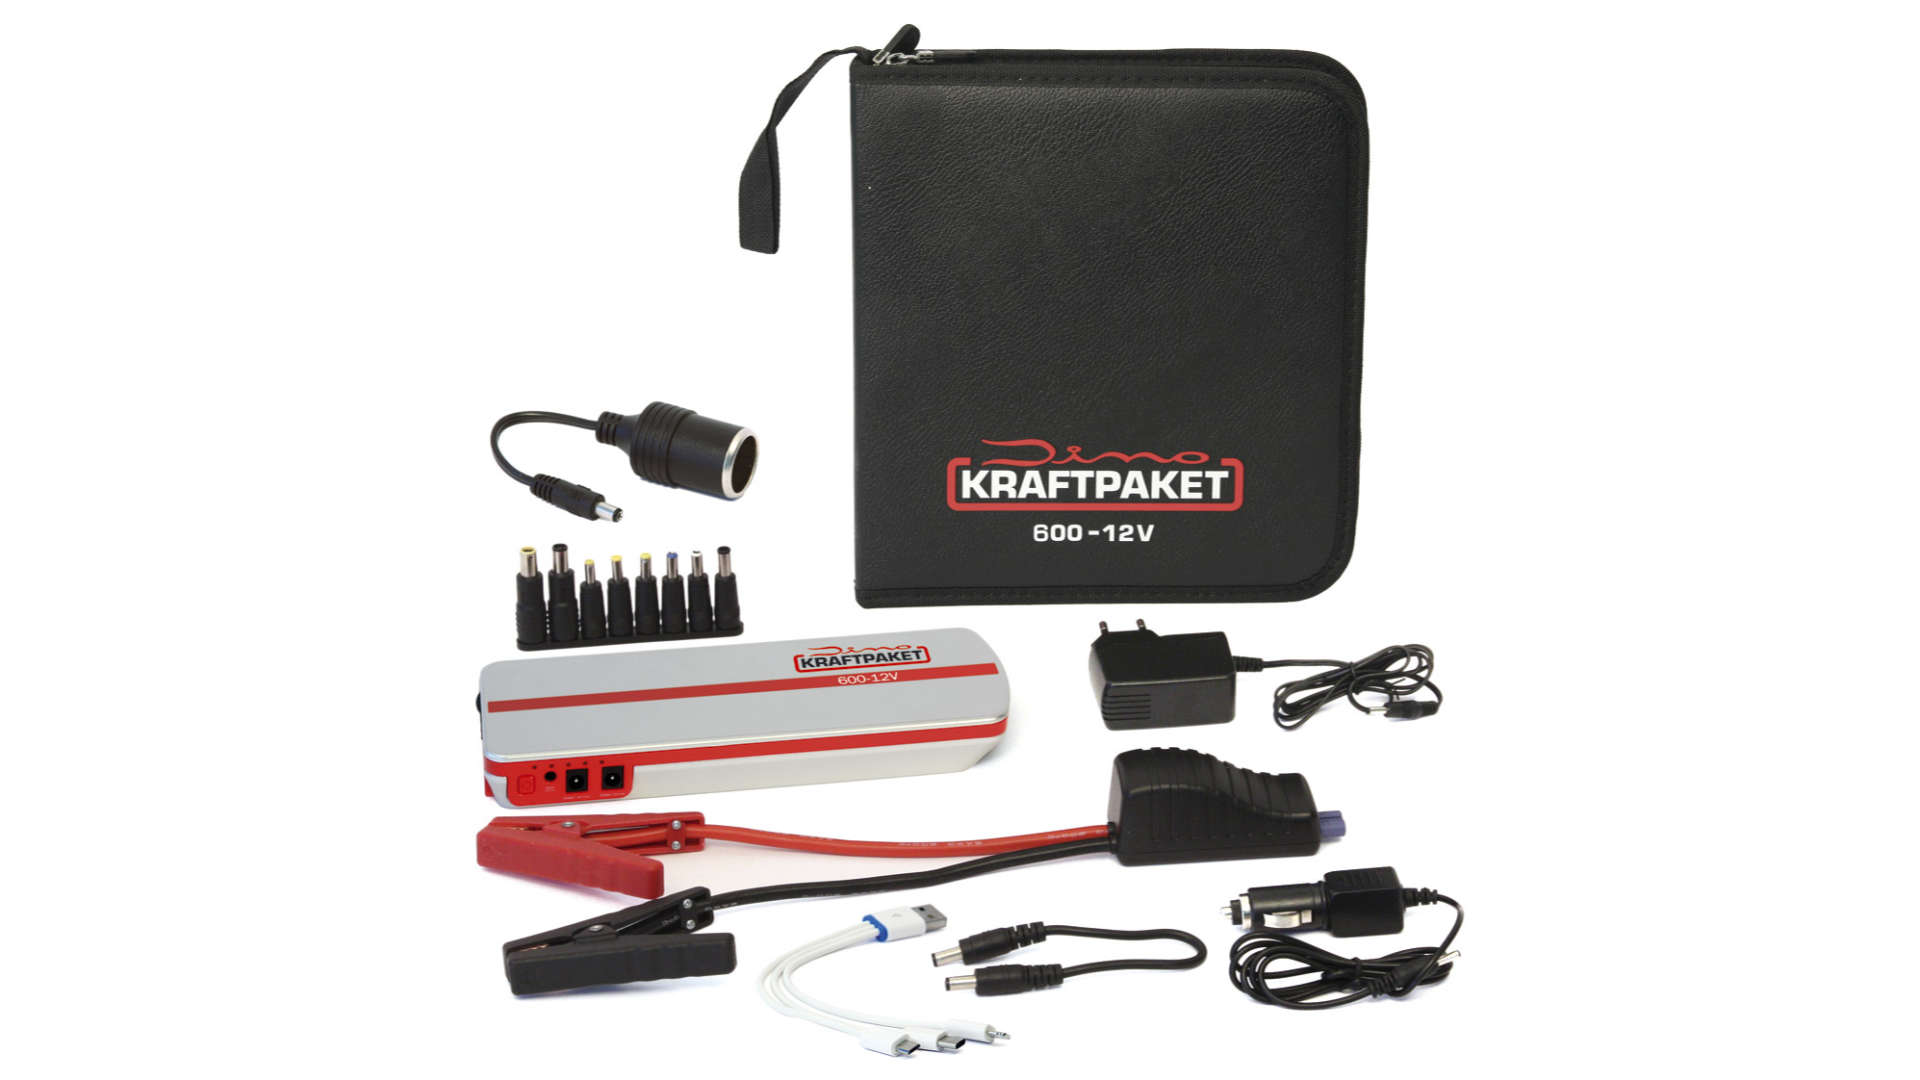 Starthilfegerät mit Powerbank Dino Kraftpaket